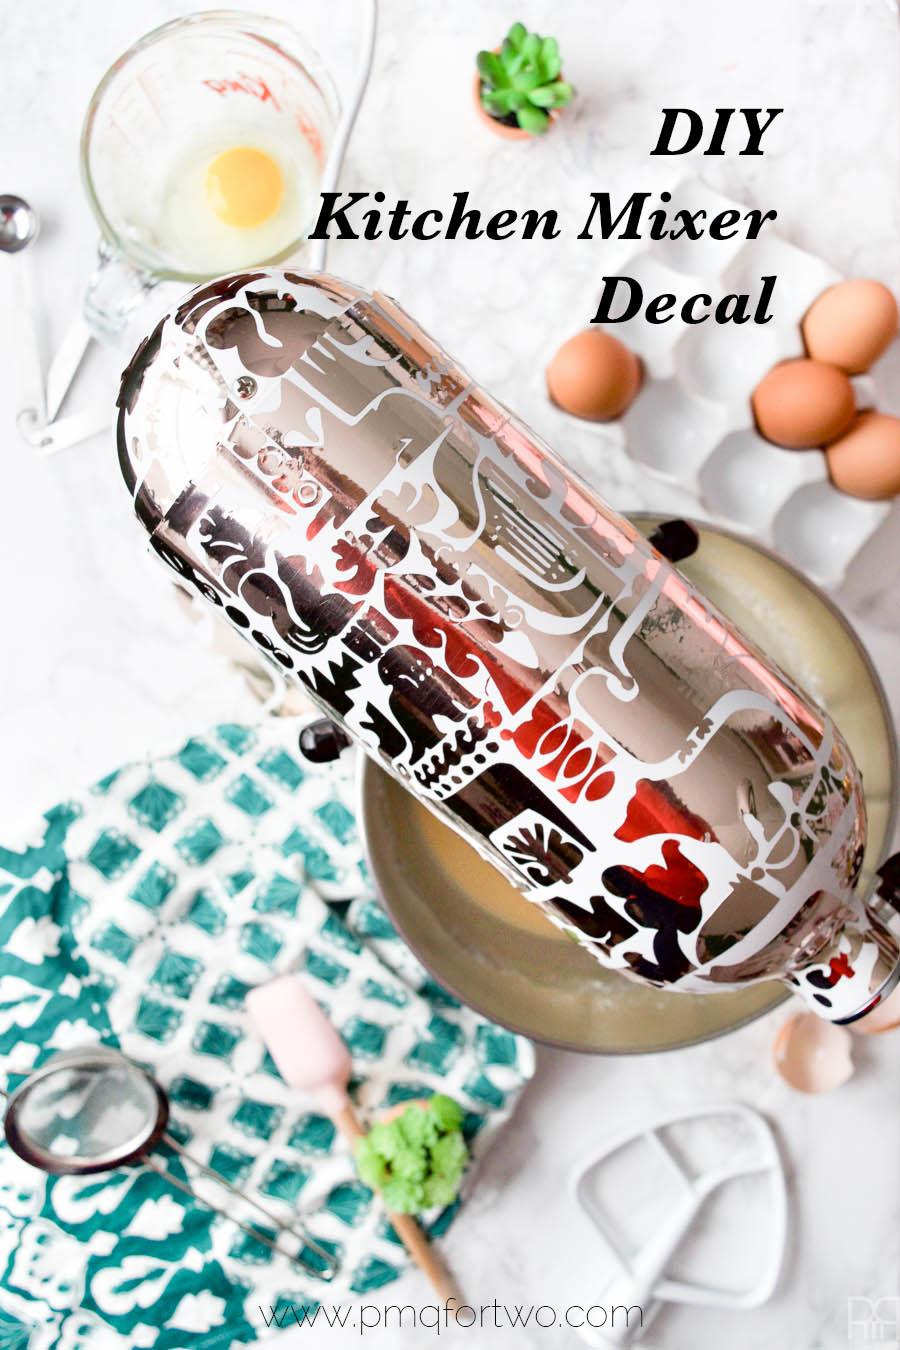 Diy Kitchenaid Mixer Decals ~ Diy kitchen aid mixer decal pmq for two